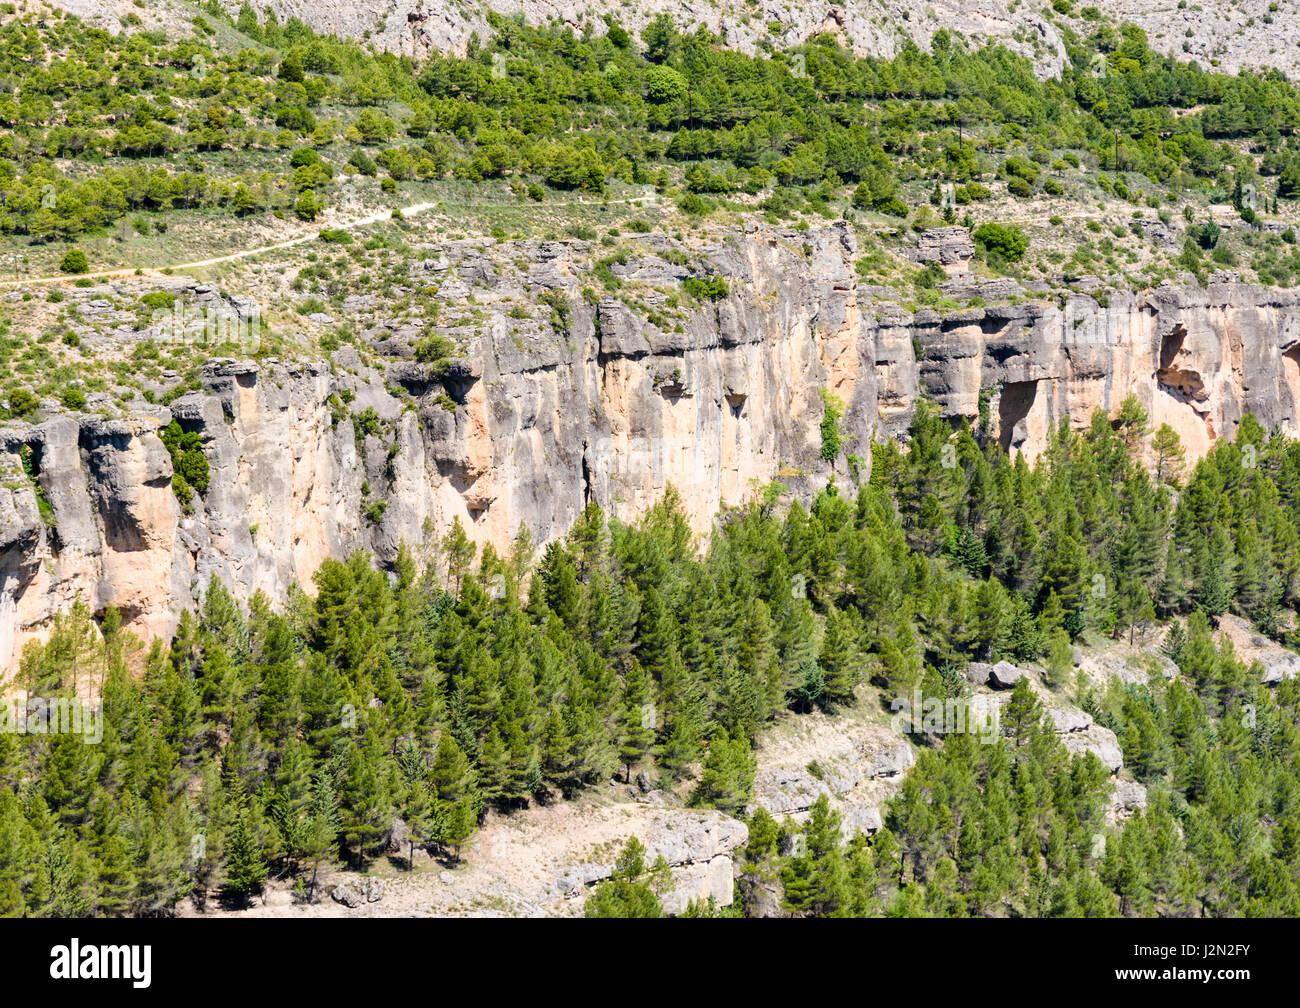 Karst Topography Forming The Jucar Gorge Castilla La